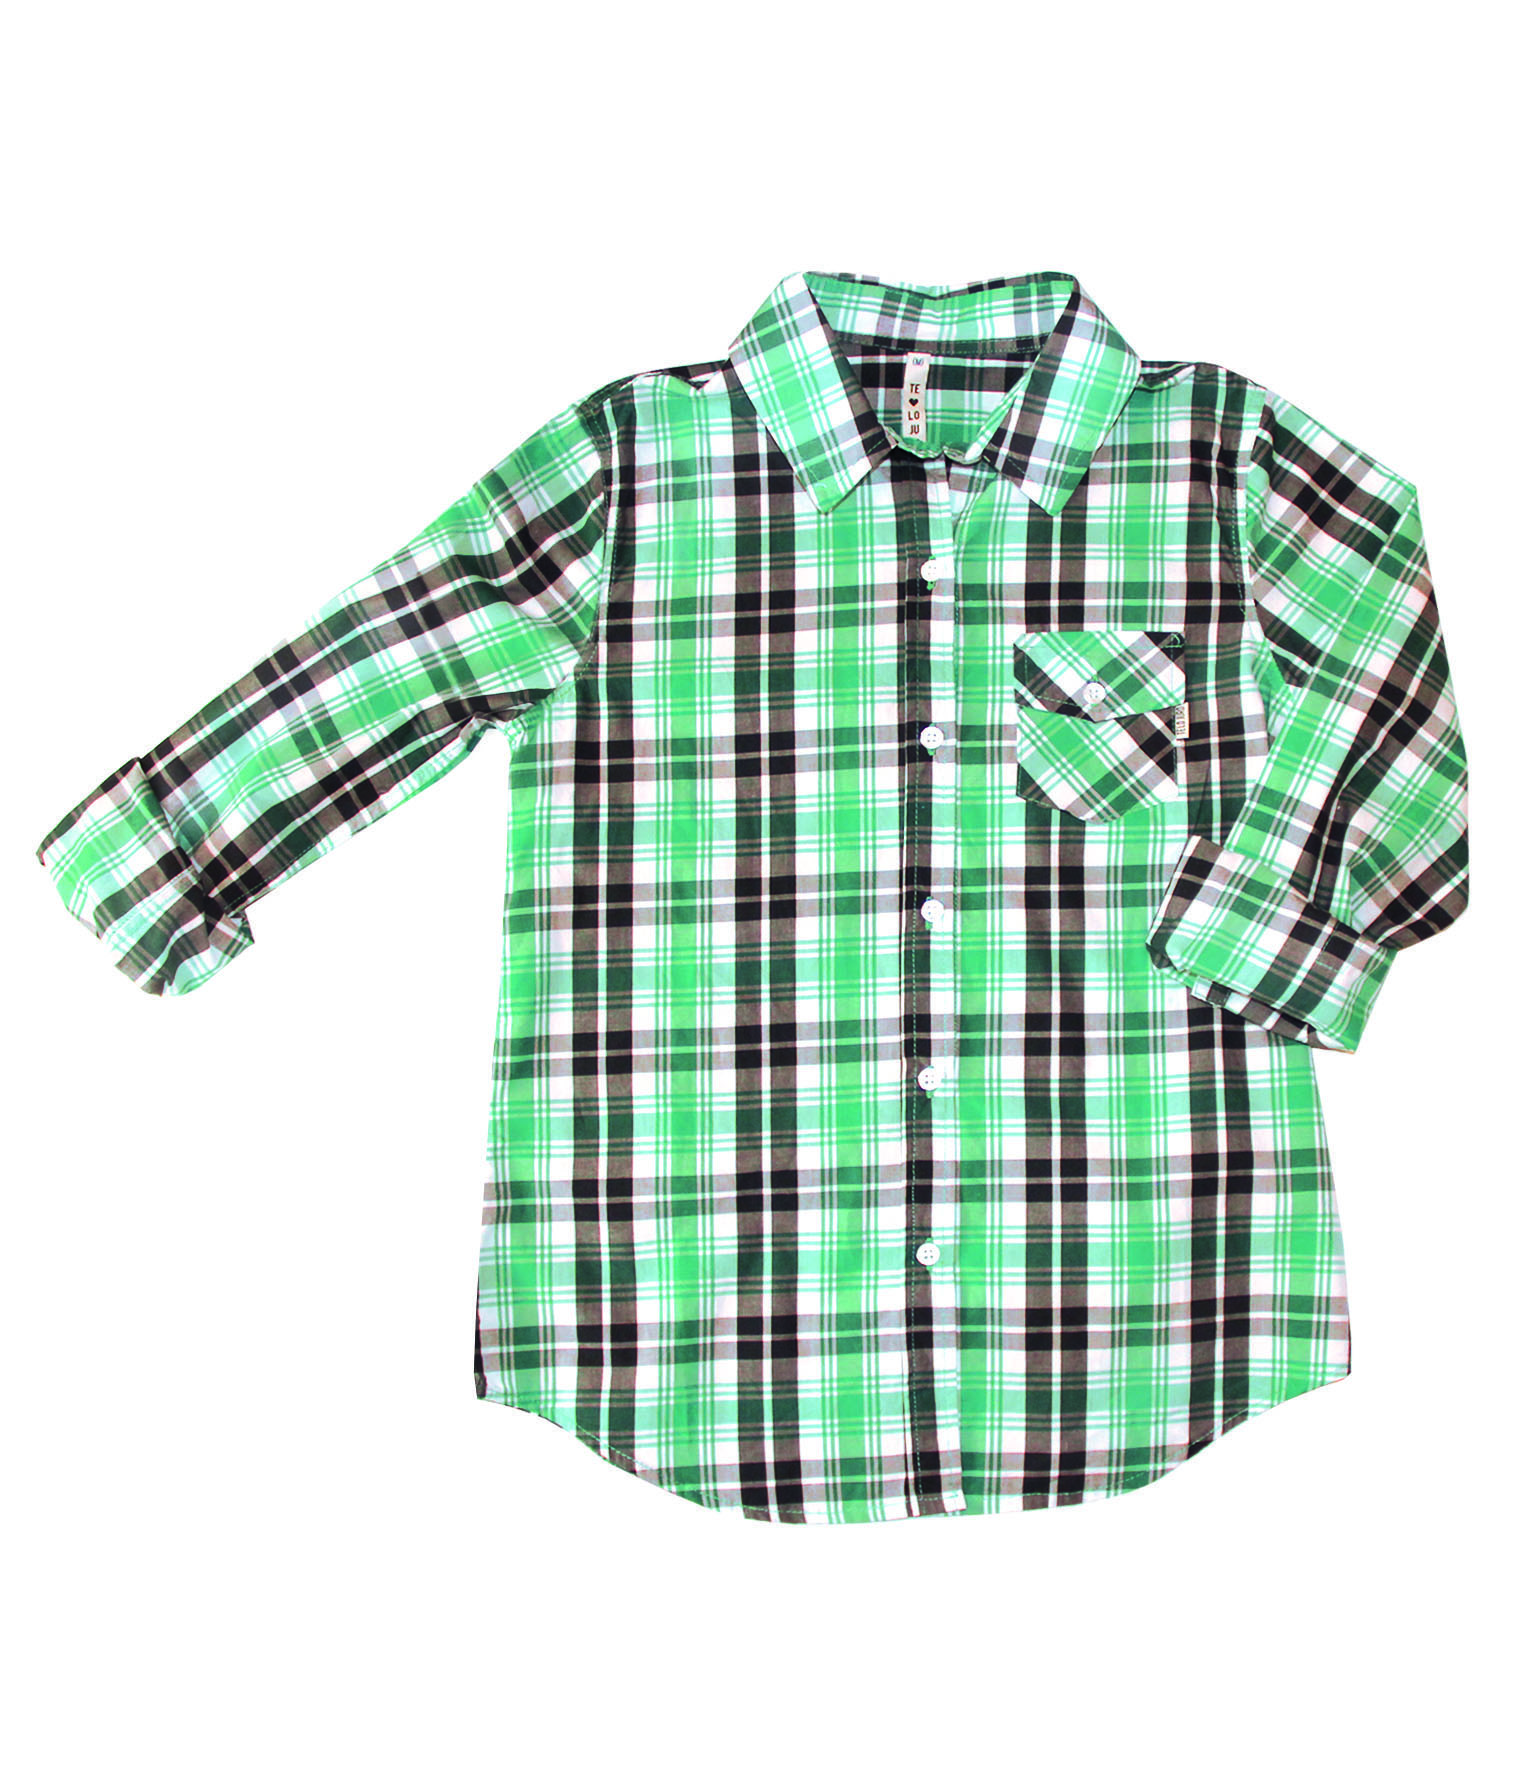 TE LO JURO  4291 camisa escocesa creme delantero.jpg $640